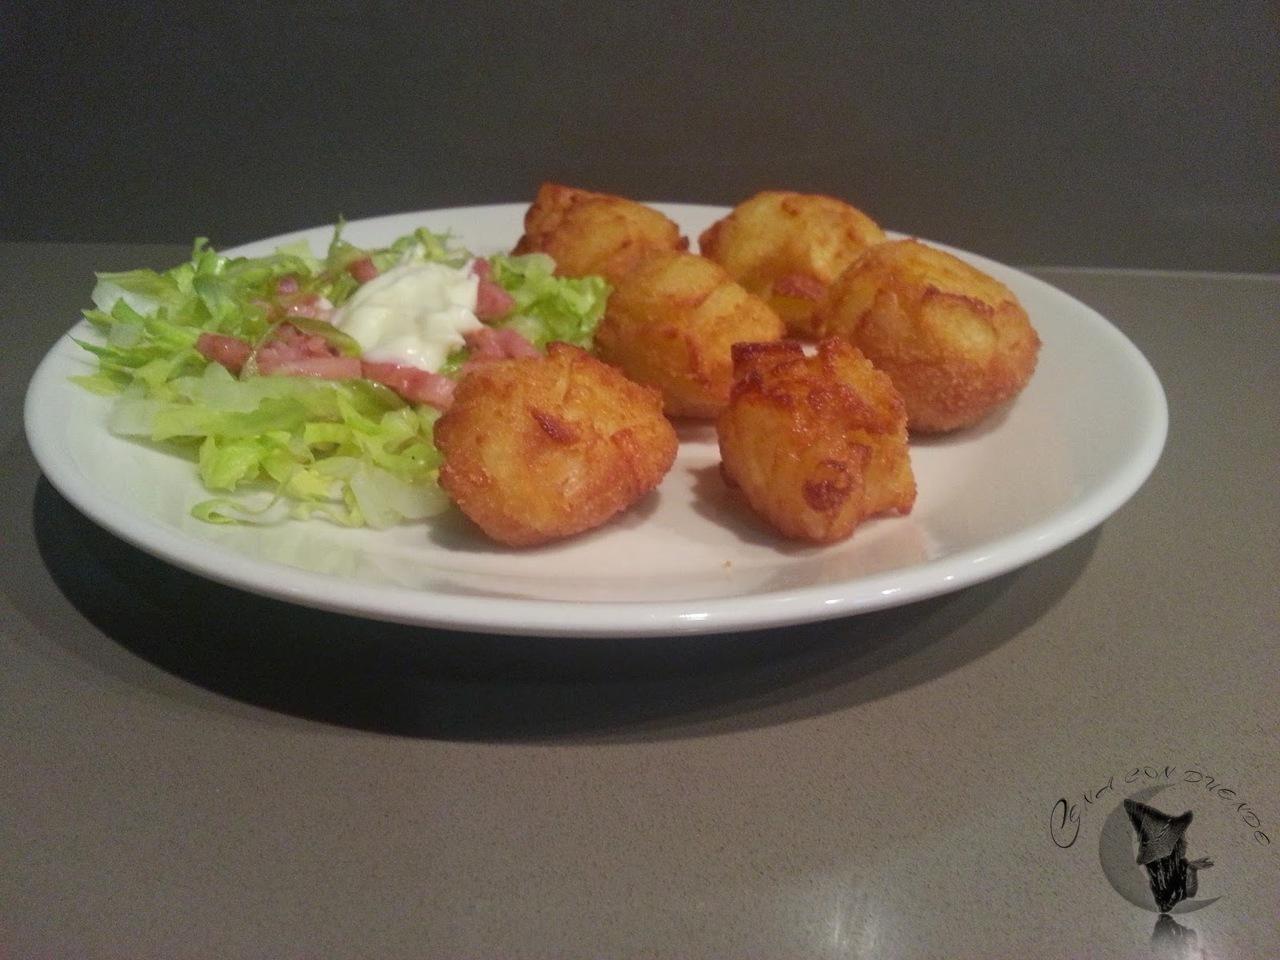 bolitas de patatas fritas con cebolla